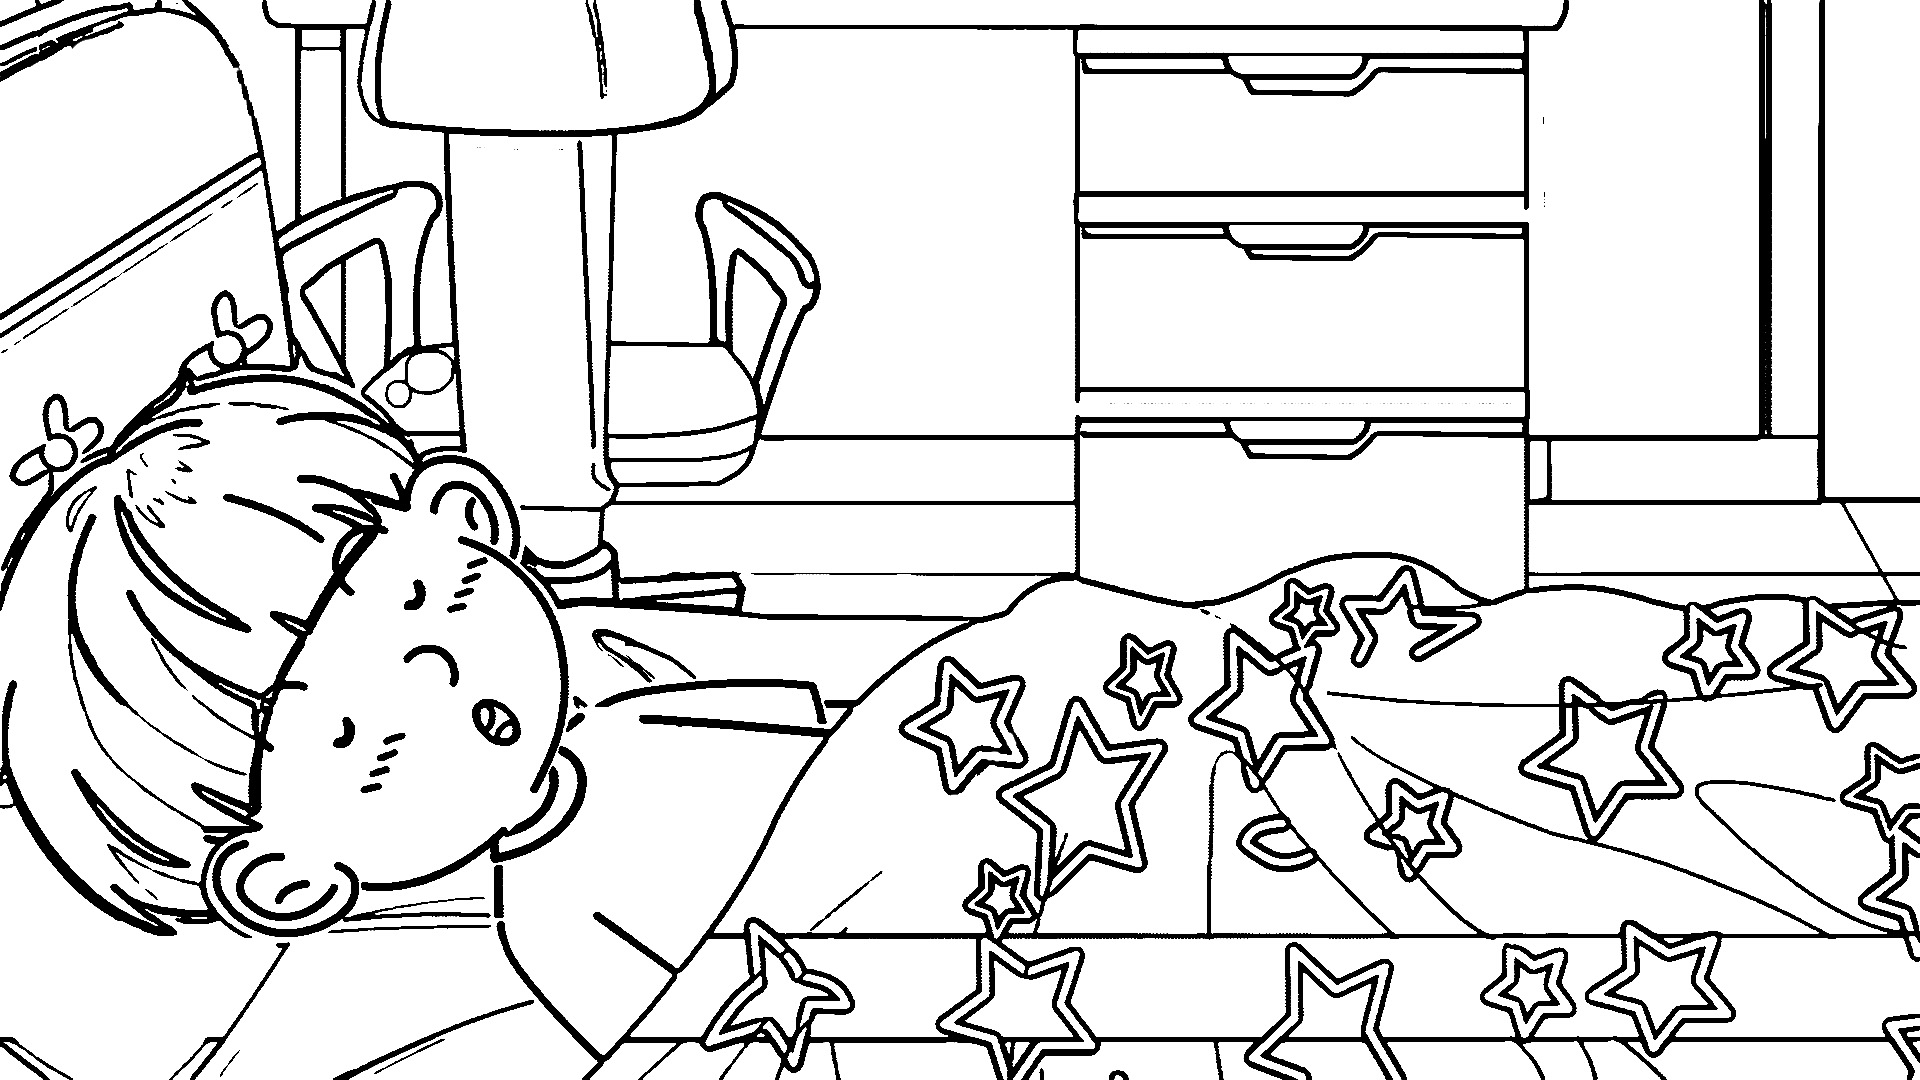 Speaking Cartoon Kids Coloring Page 33